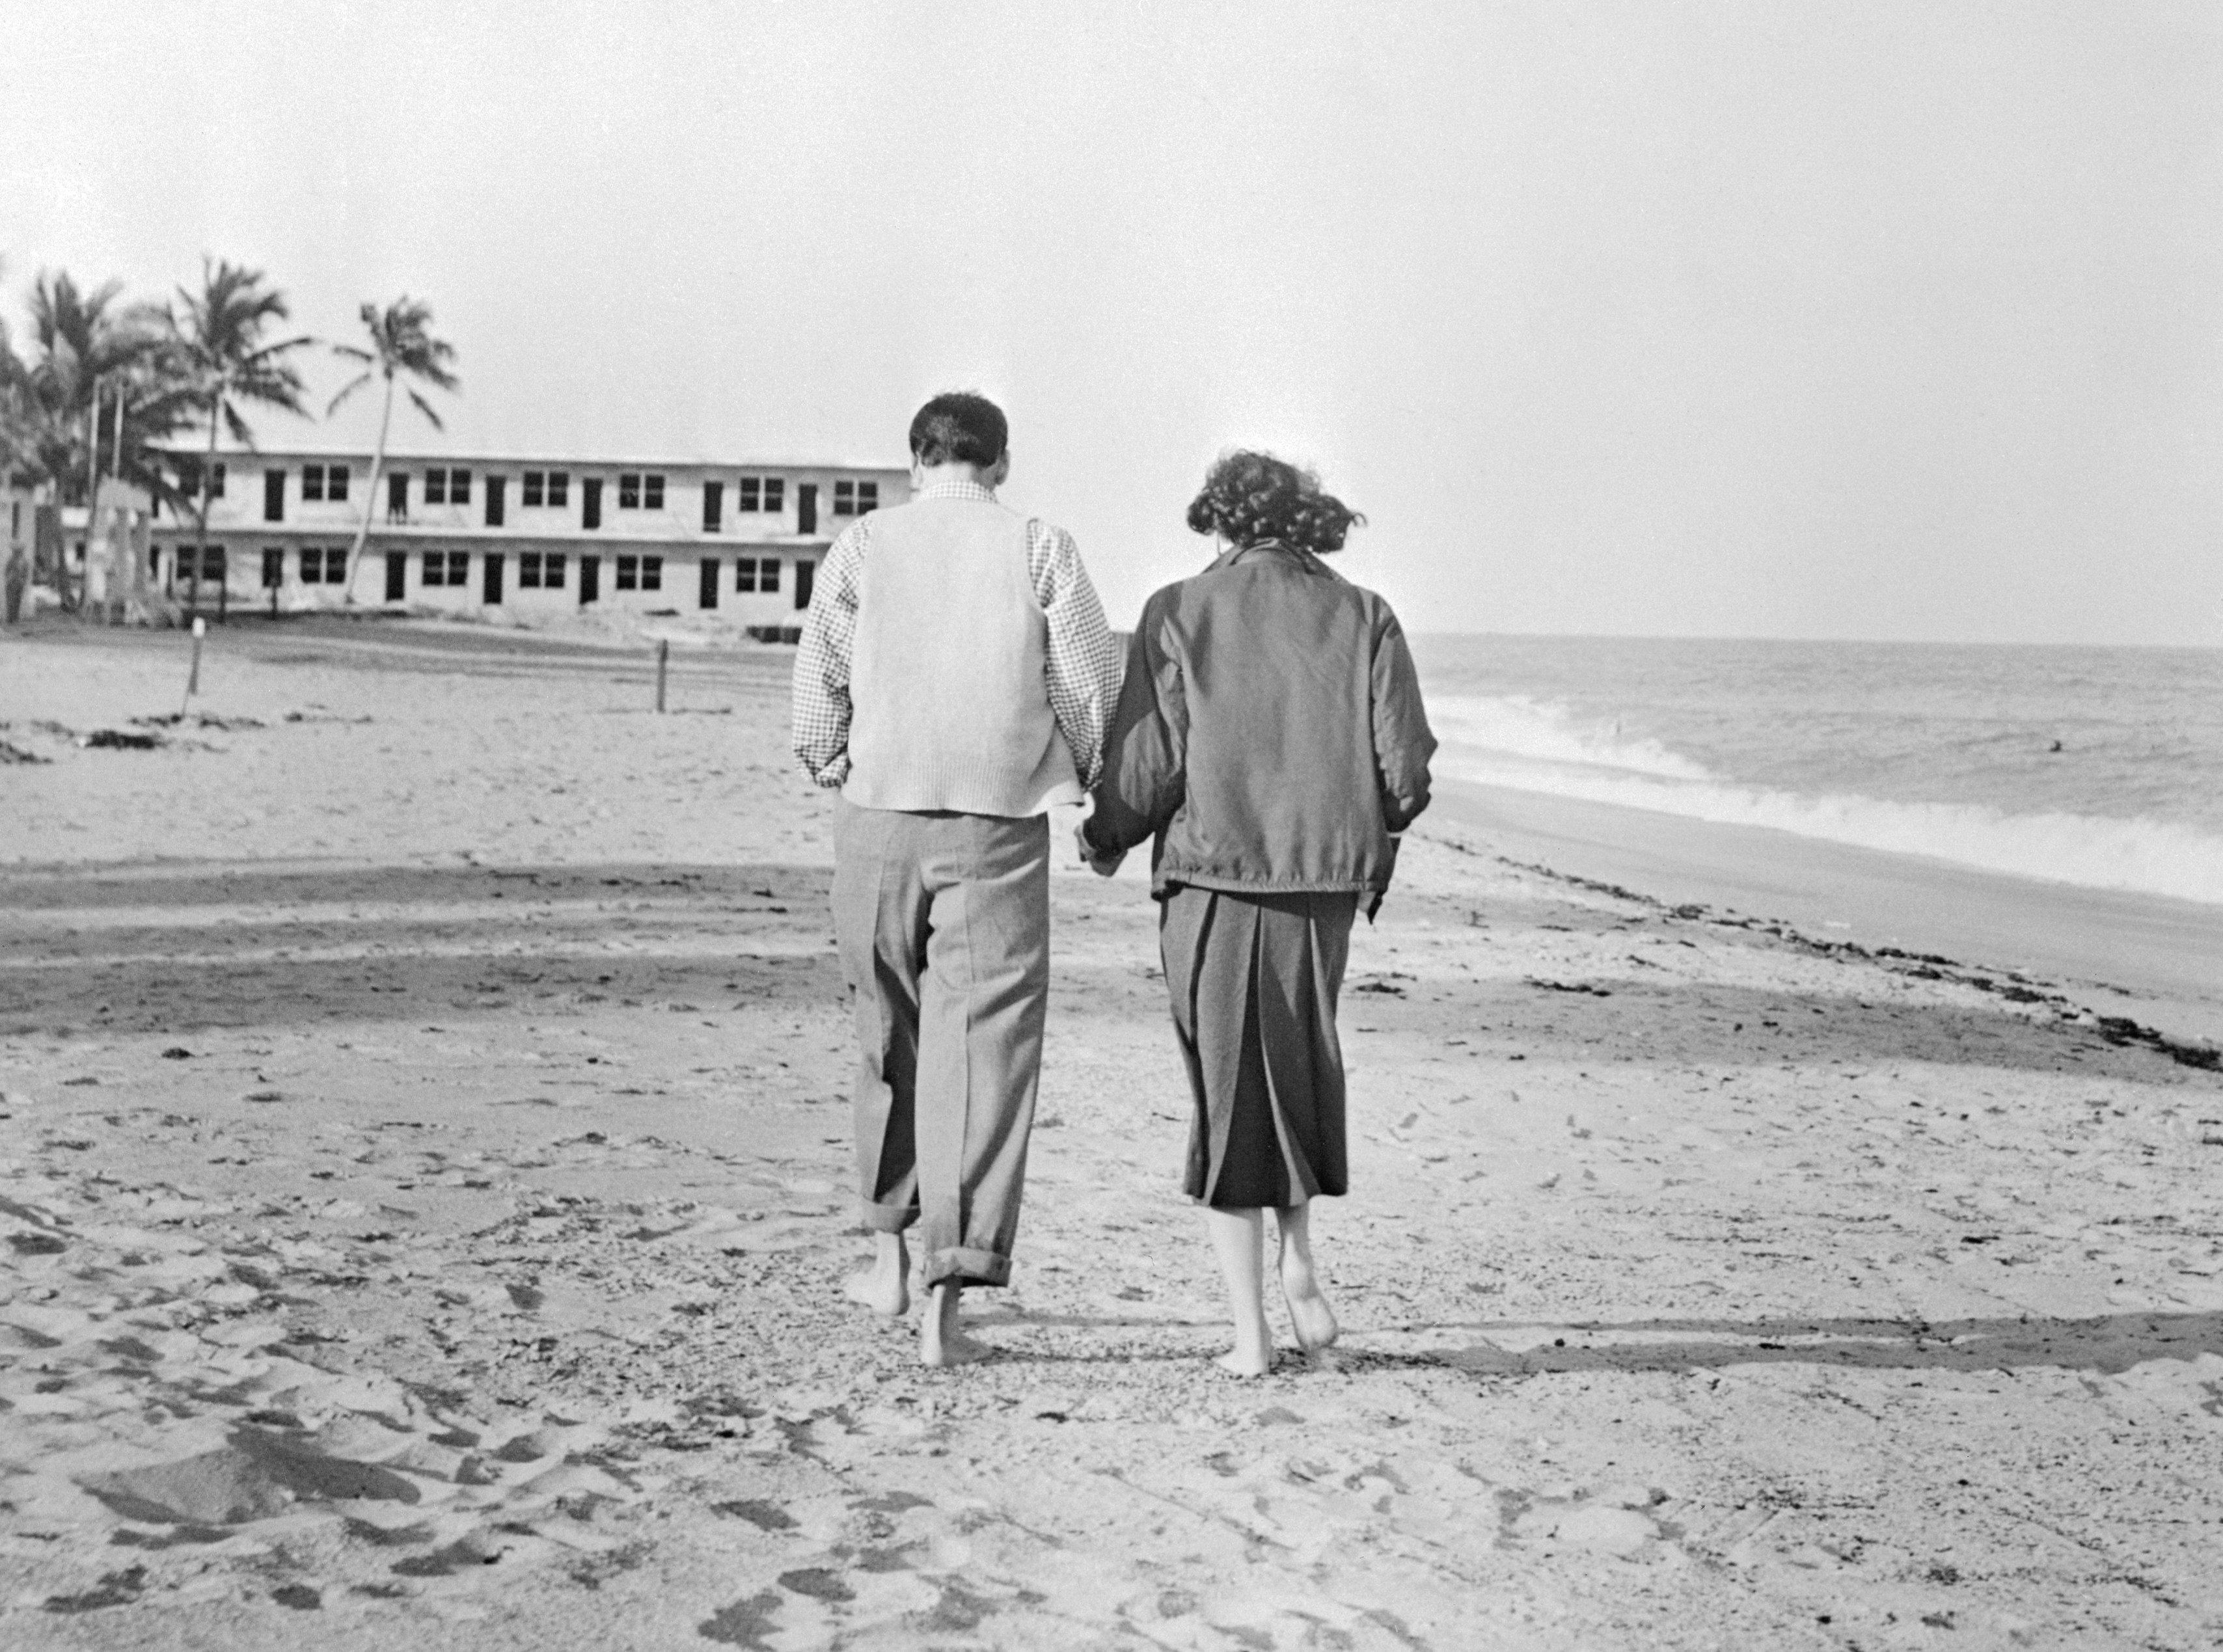 Frank Sinatra and Ava Gardner Walking on Beach